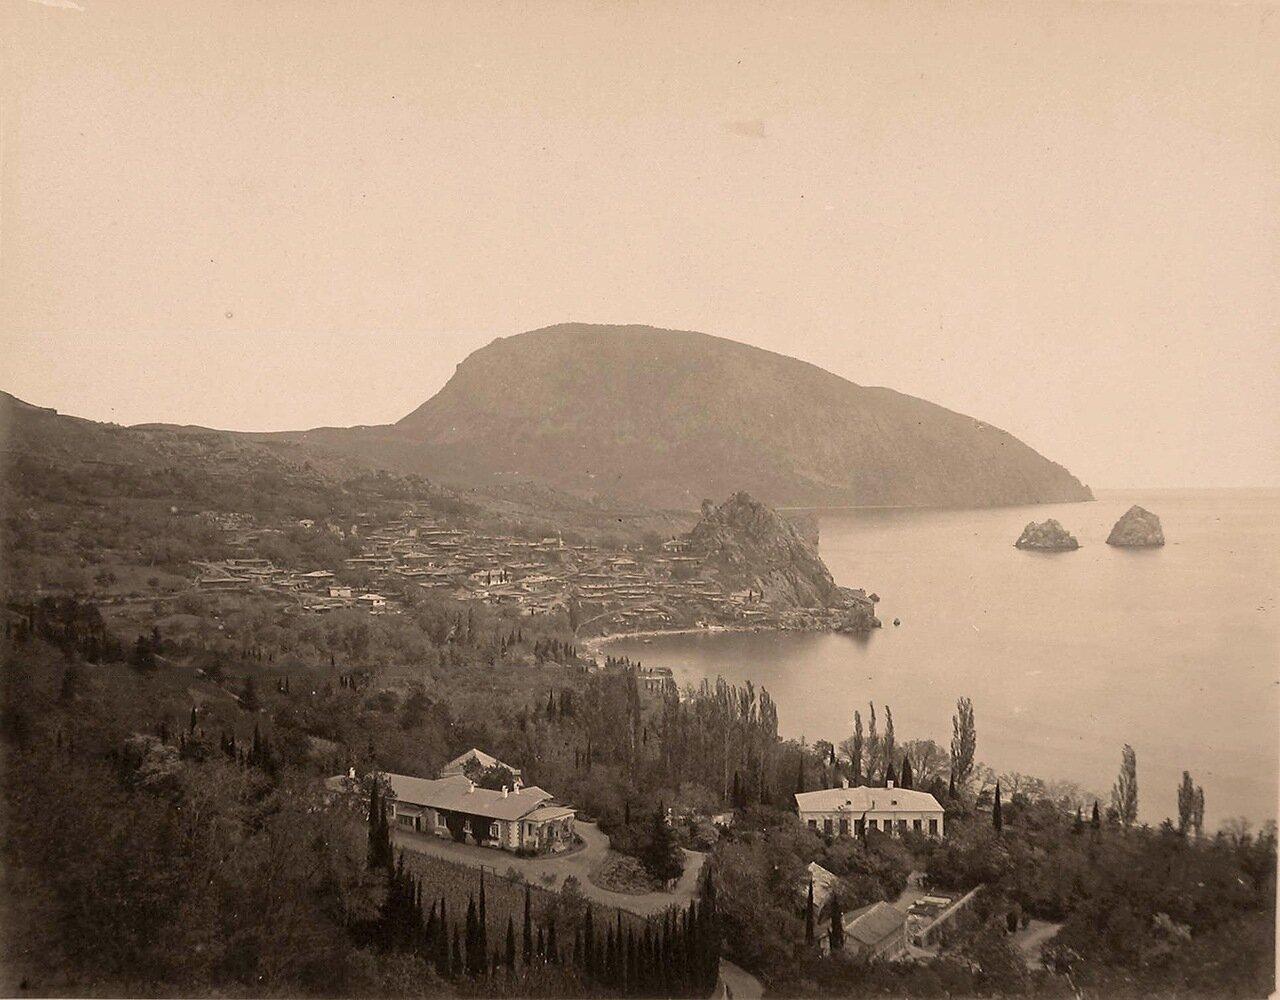 17. Вид на город; справа - скалы Адалары, на втором плане - гора Аю-Даг